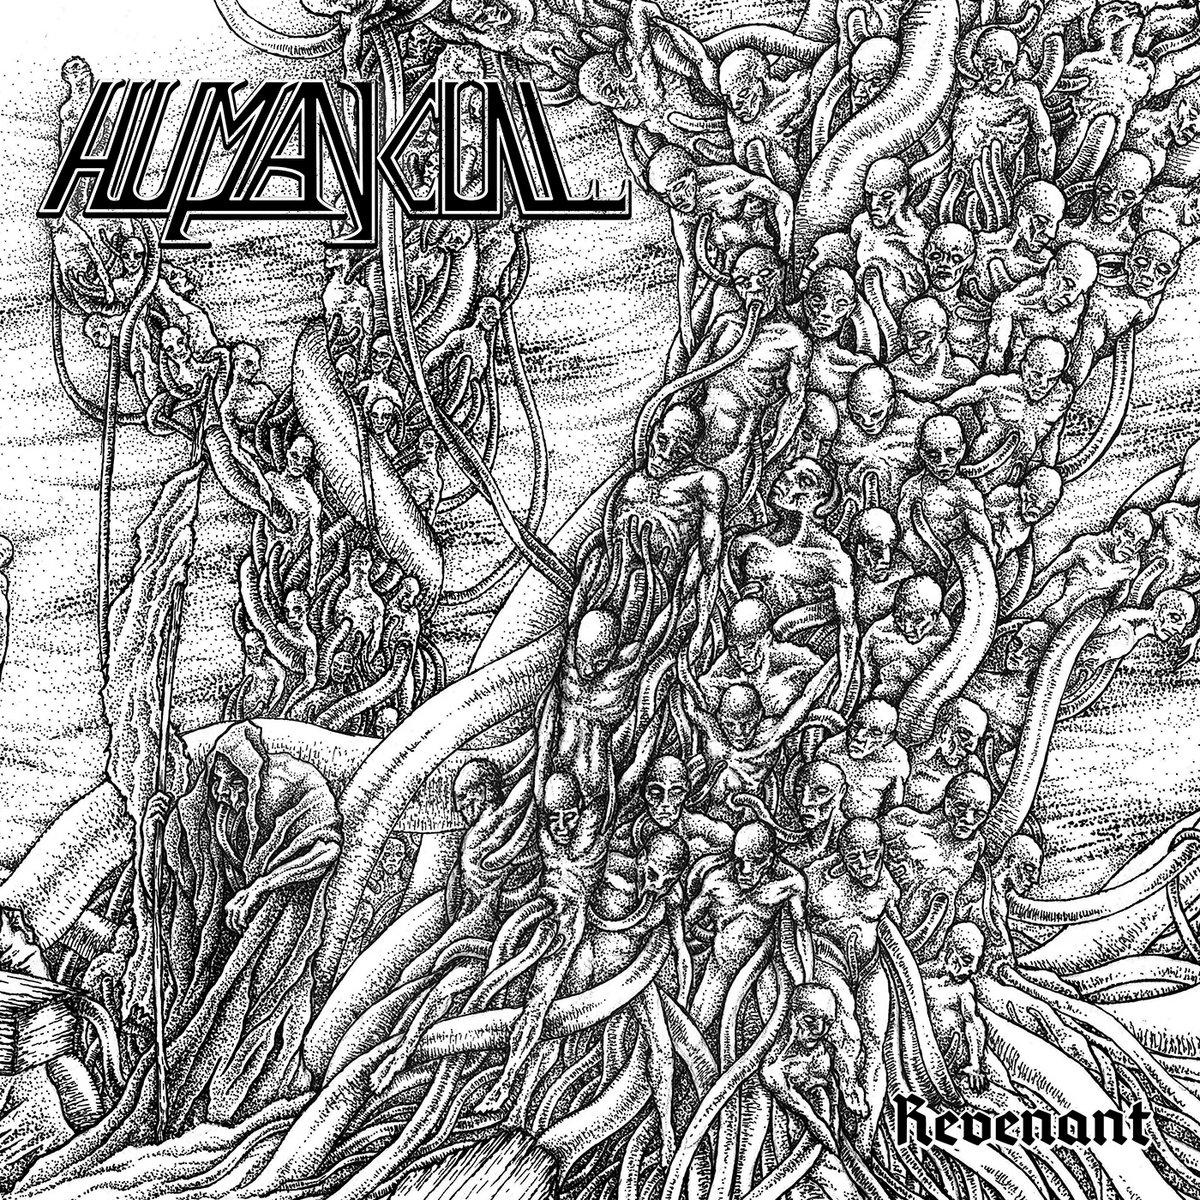 Human Cull - Revenant [EP] (2018)